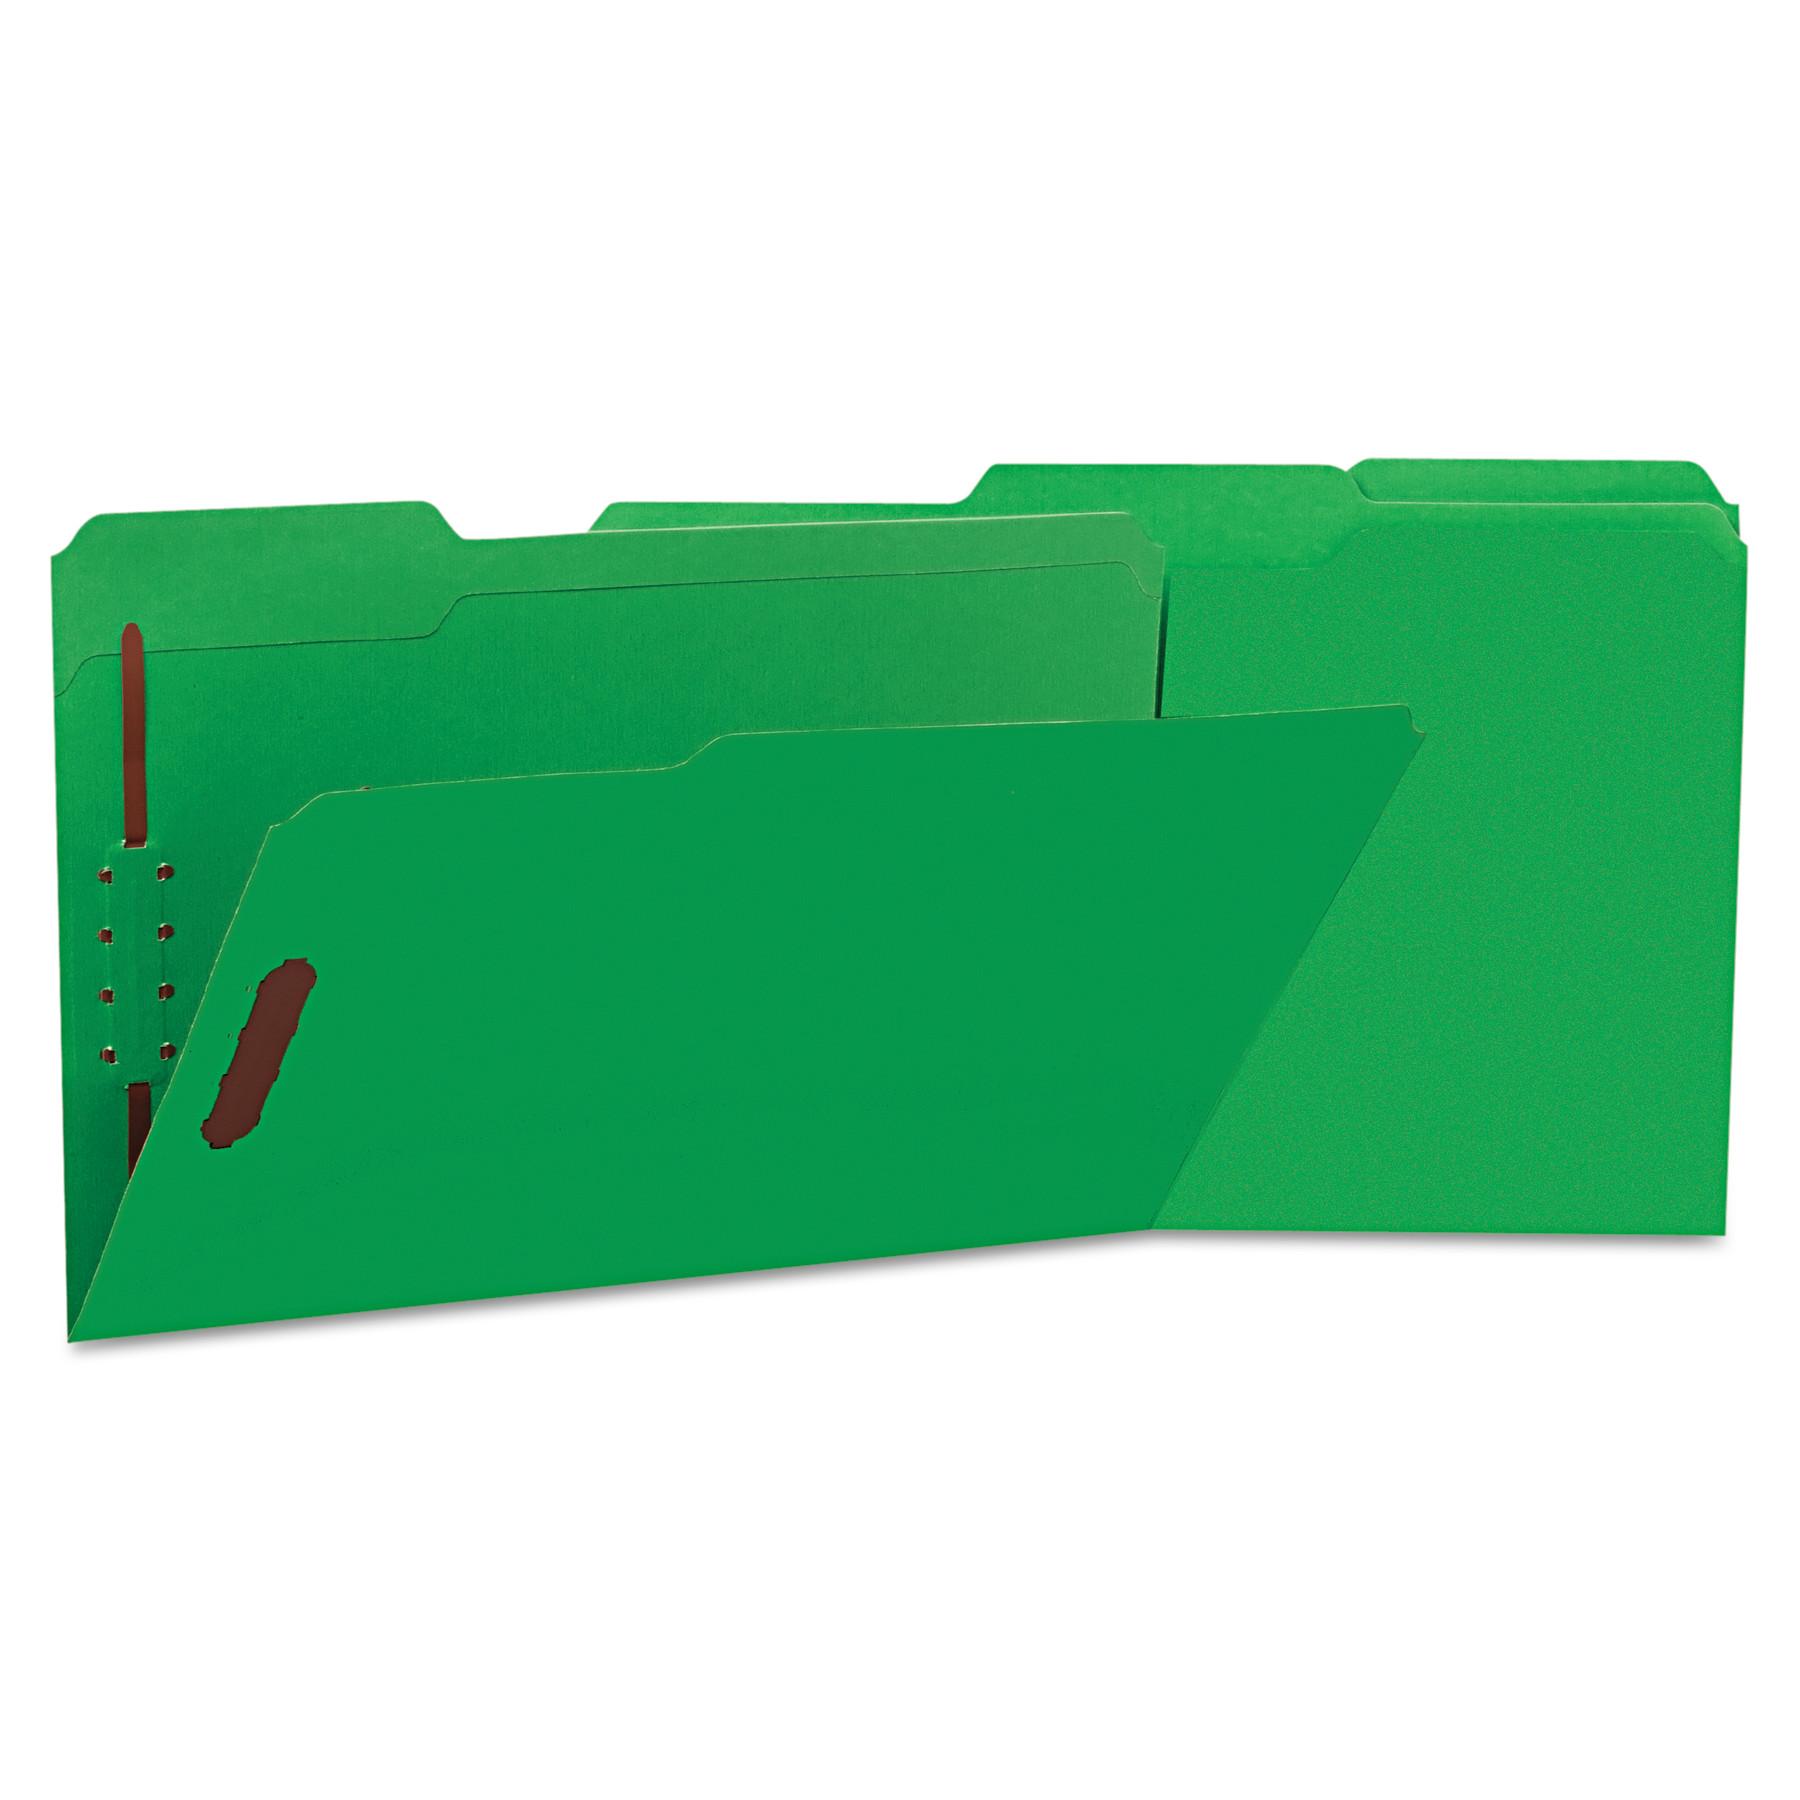 Deluxe Reinforced Top Tab Folders, 2 Fasteners, 1/3 Tab, Legal, Green, 50/Box